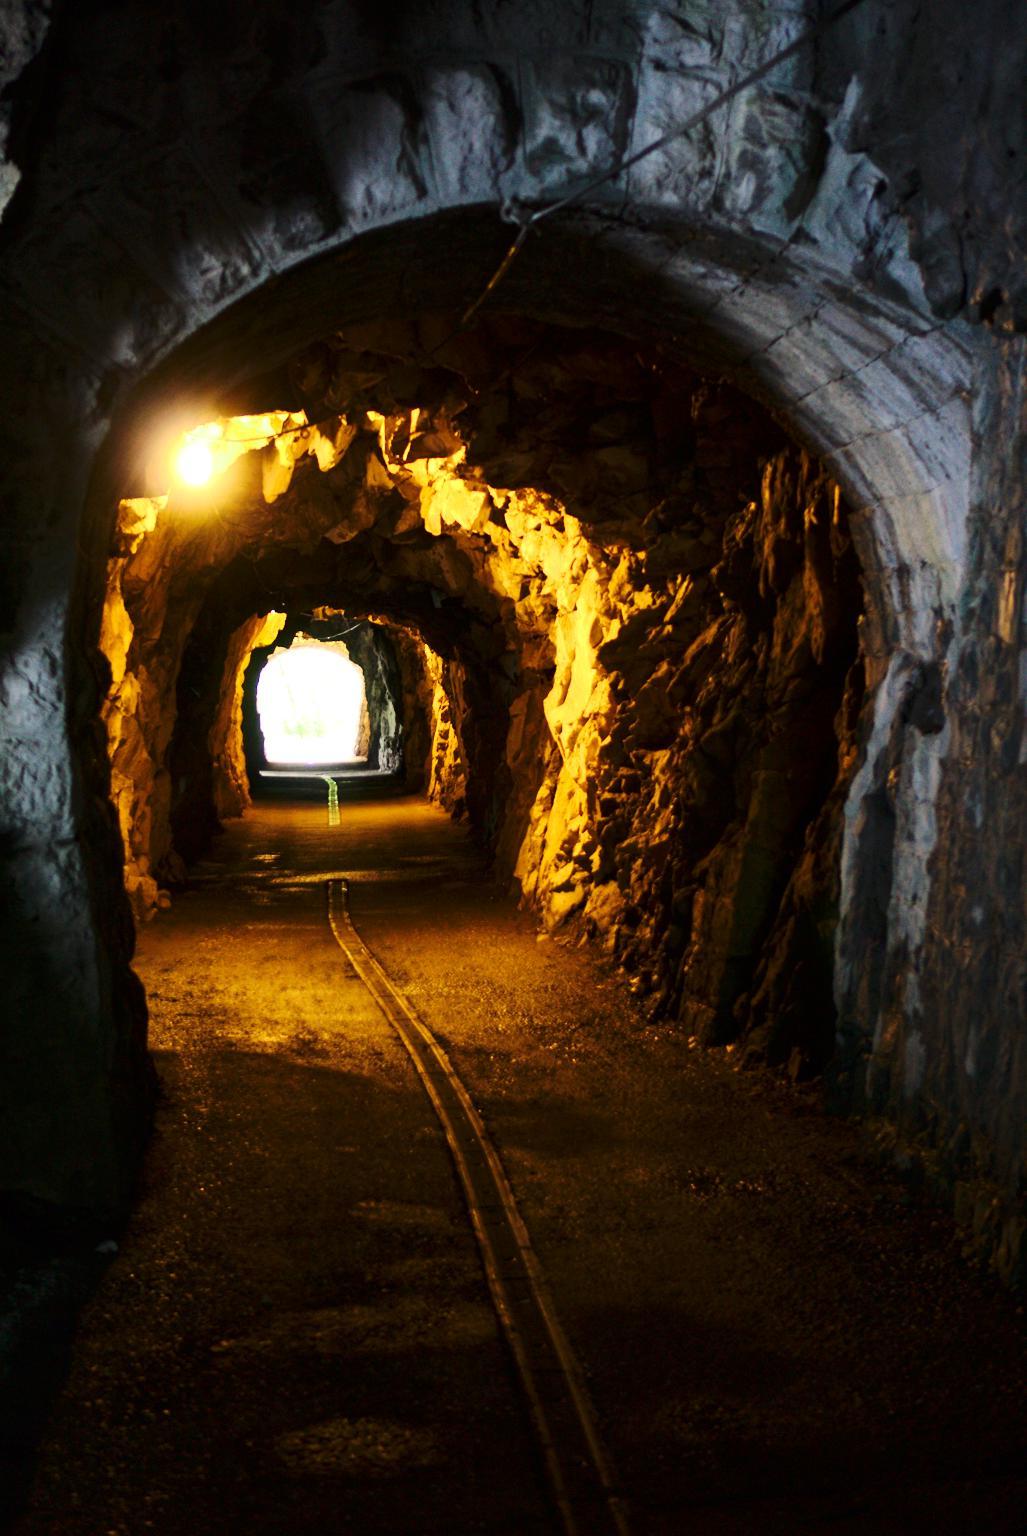 {filename}/img/walensee-tunel.jpg